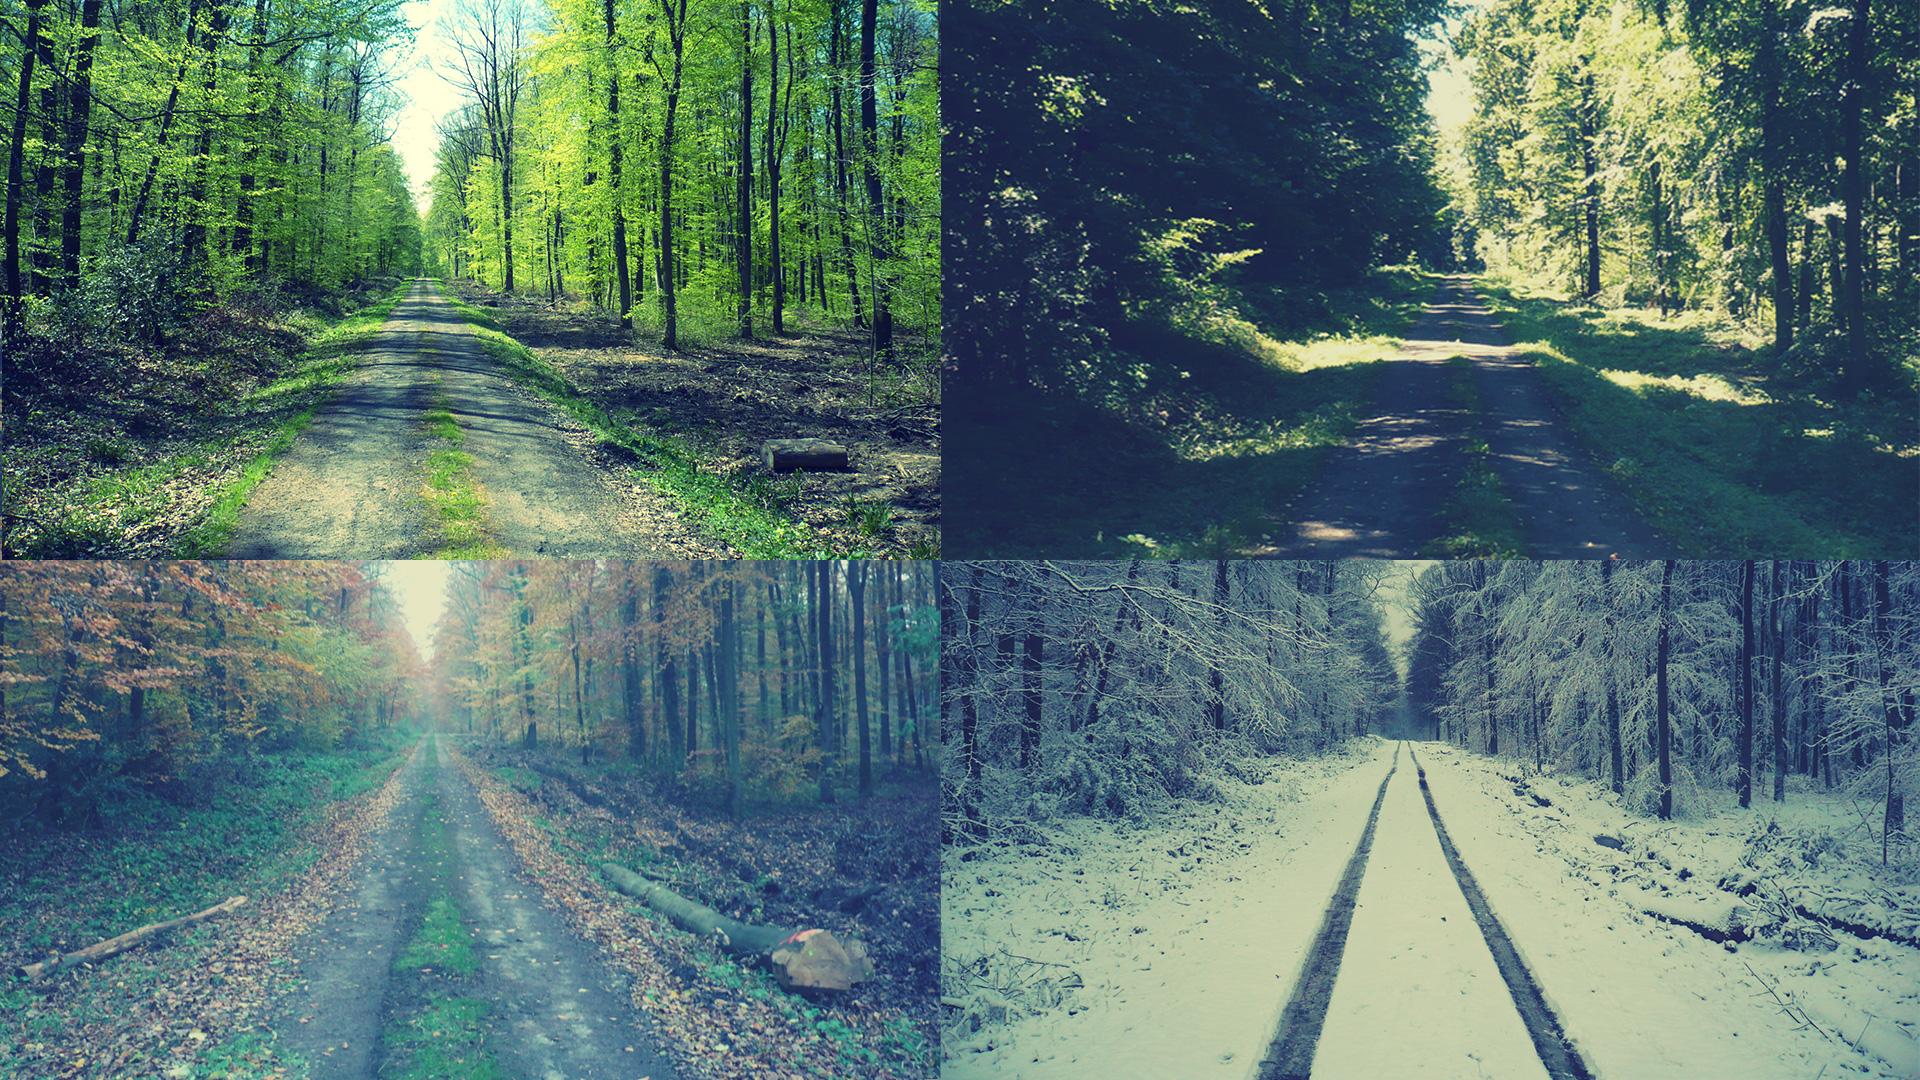 Slide seasons